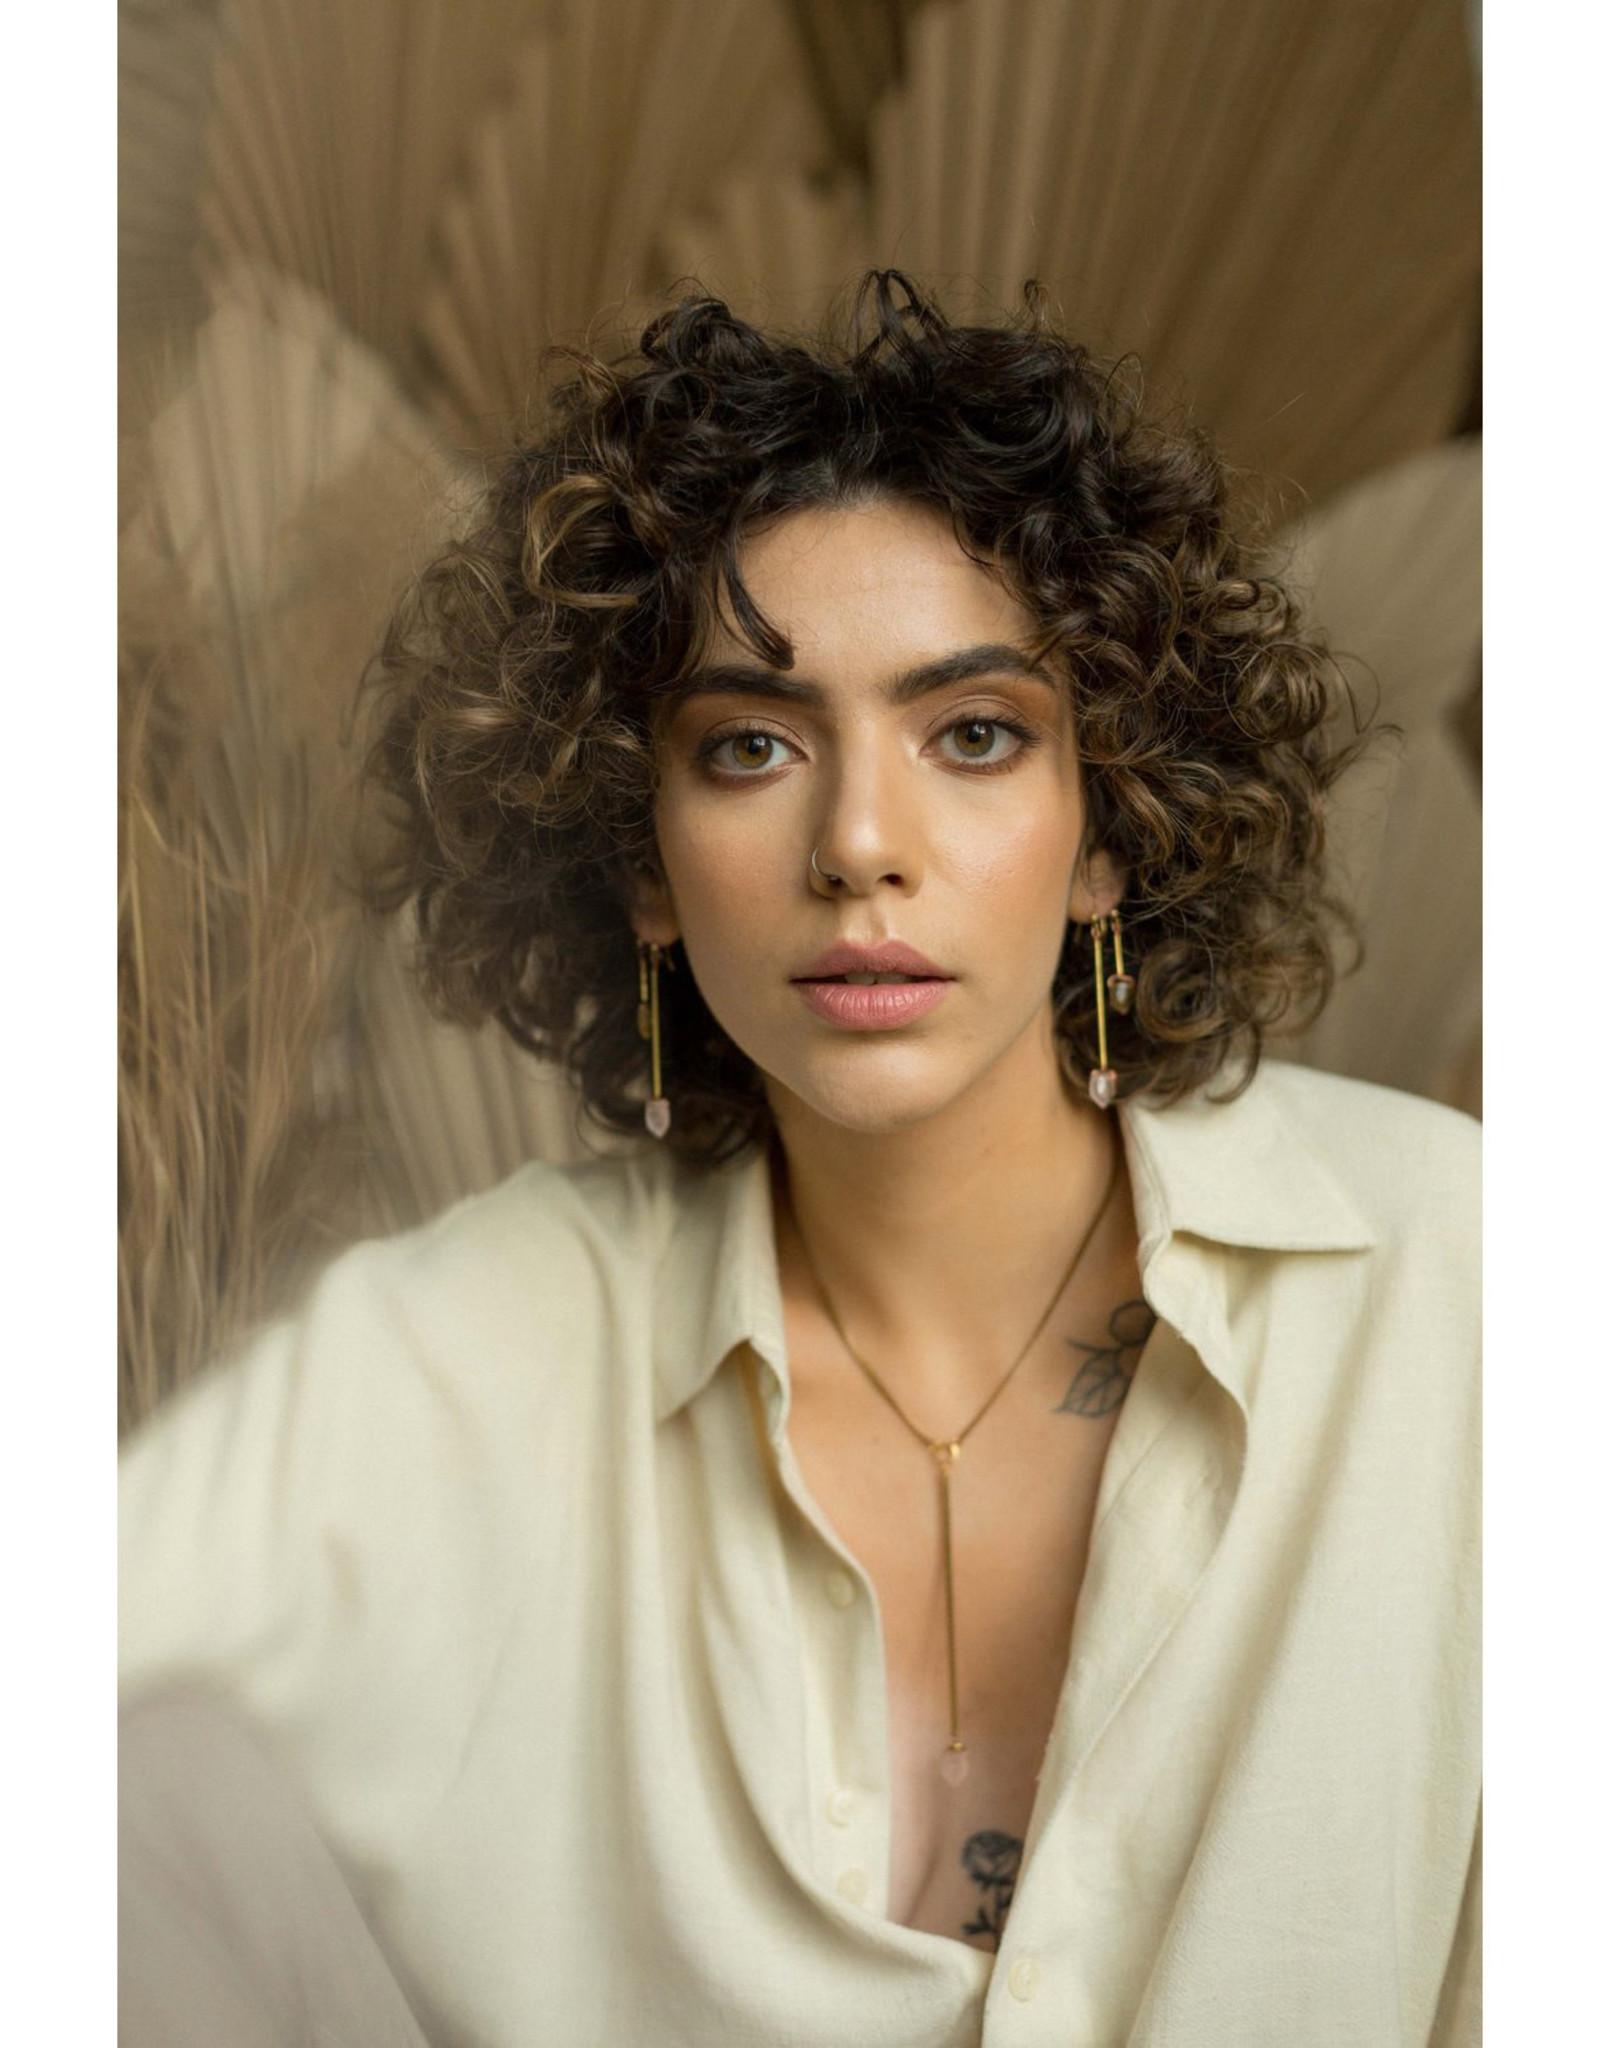 Hailey Gerrits Designs Fern Earrings - Labradorite